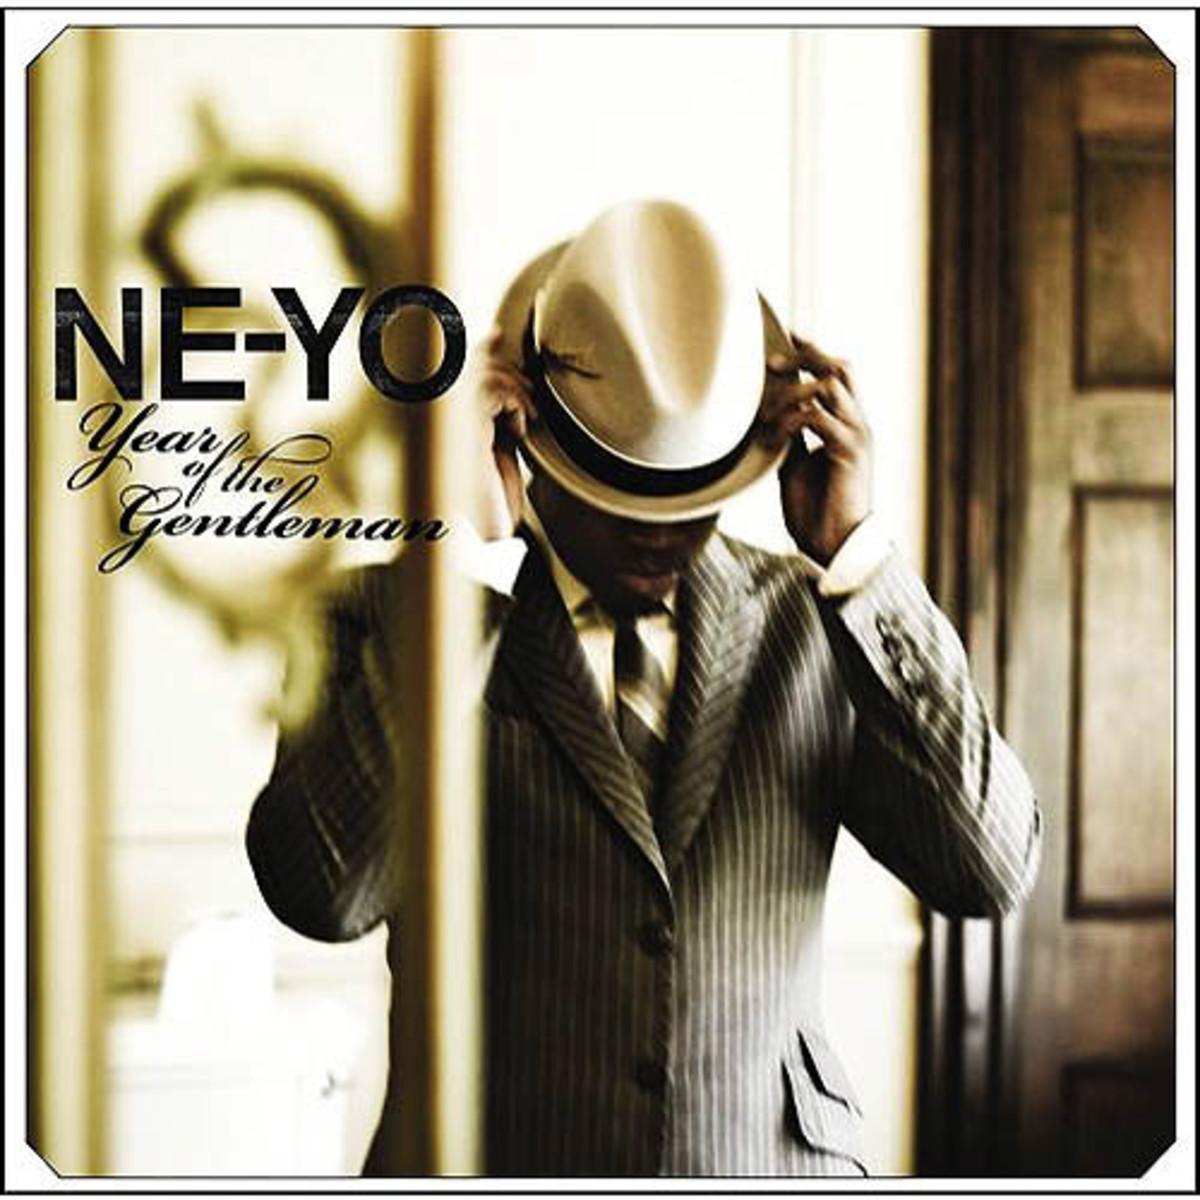 Year of the Gentleman - album cover